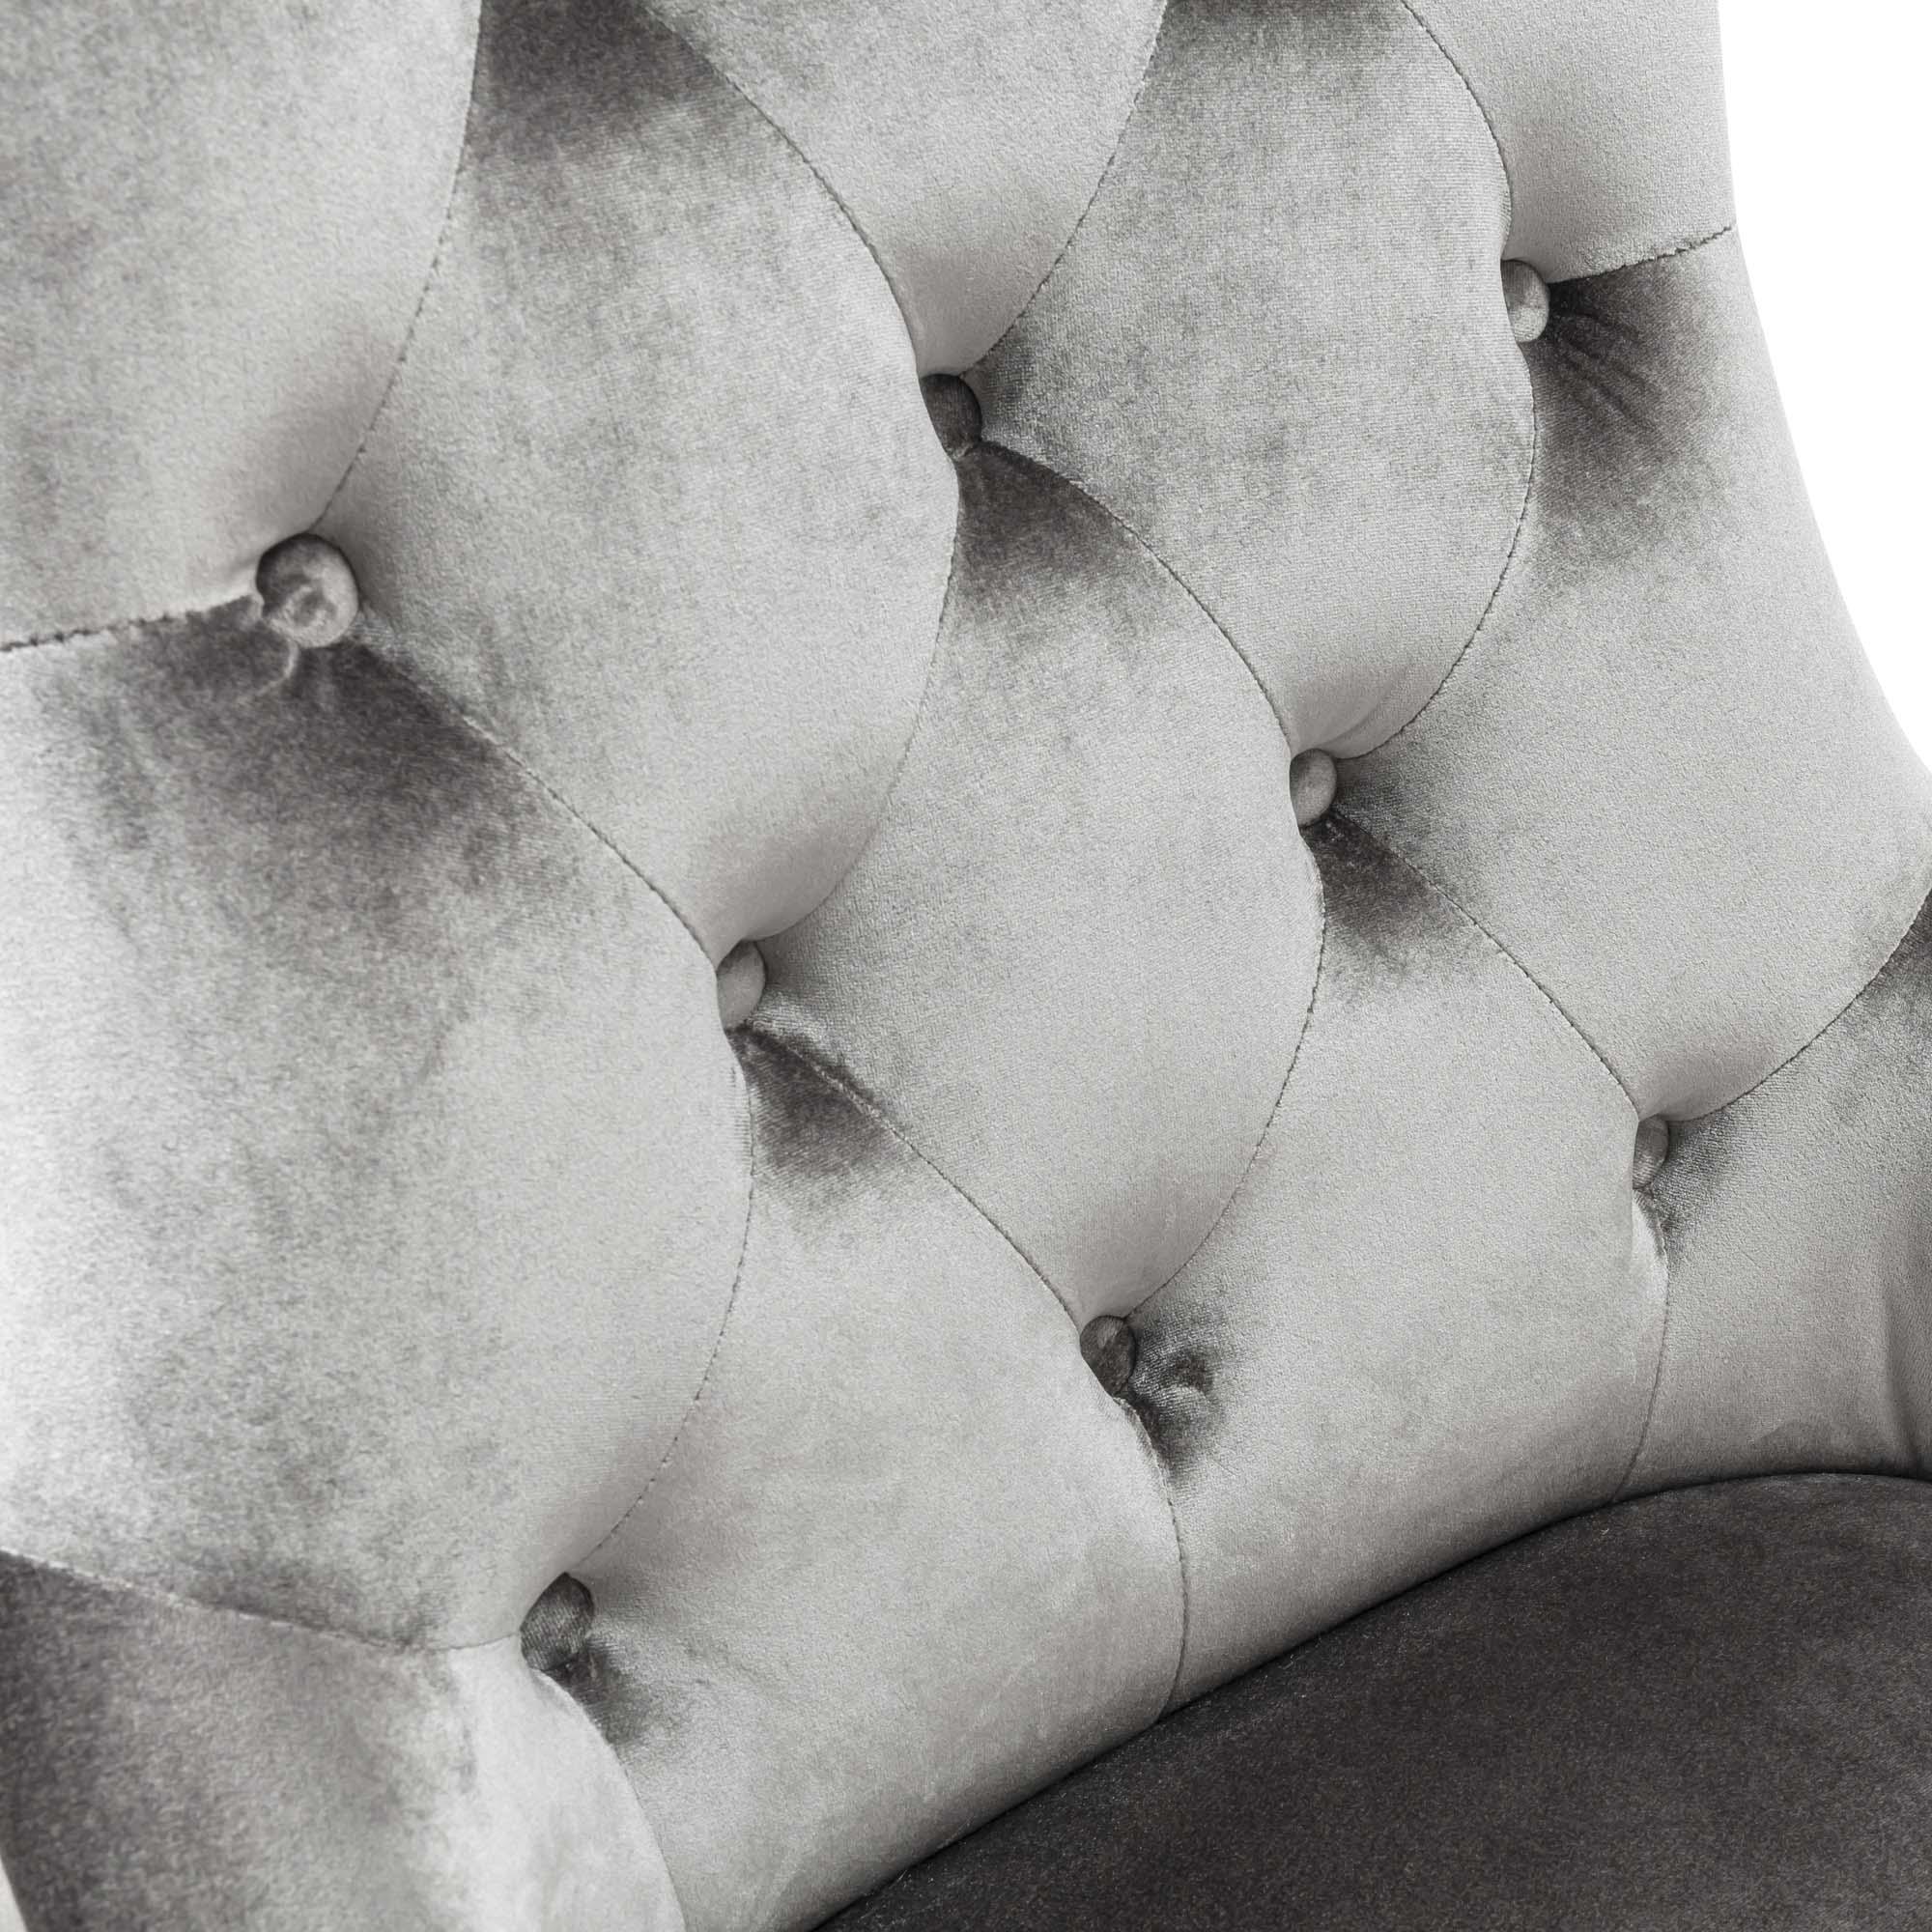 Chelsea Silver Velvet Upholstered Scoop Dining Chair – Hoop – Stainless Steel Legs